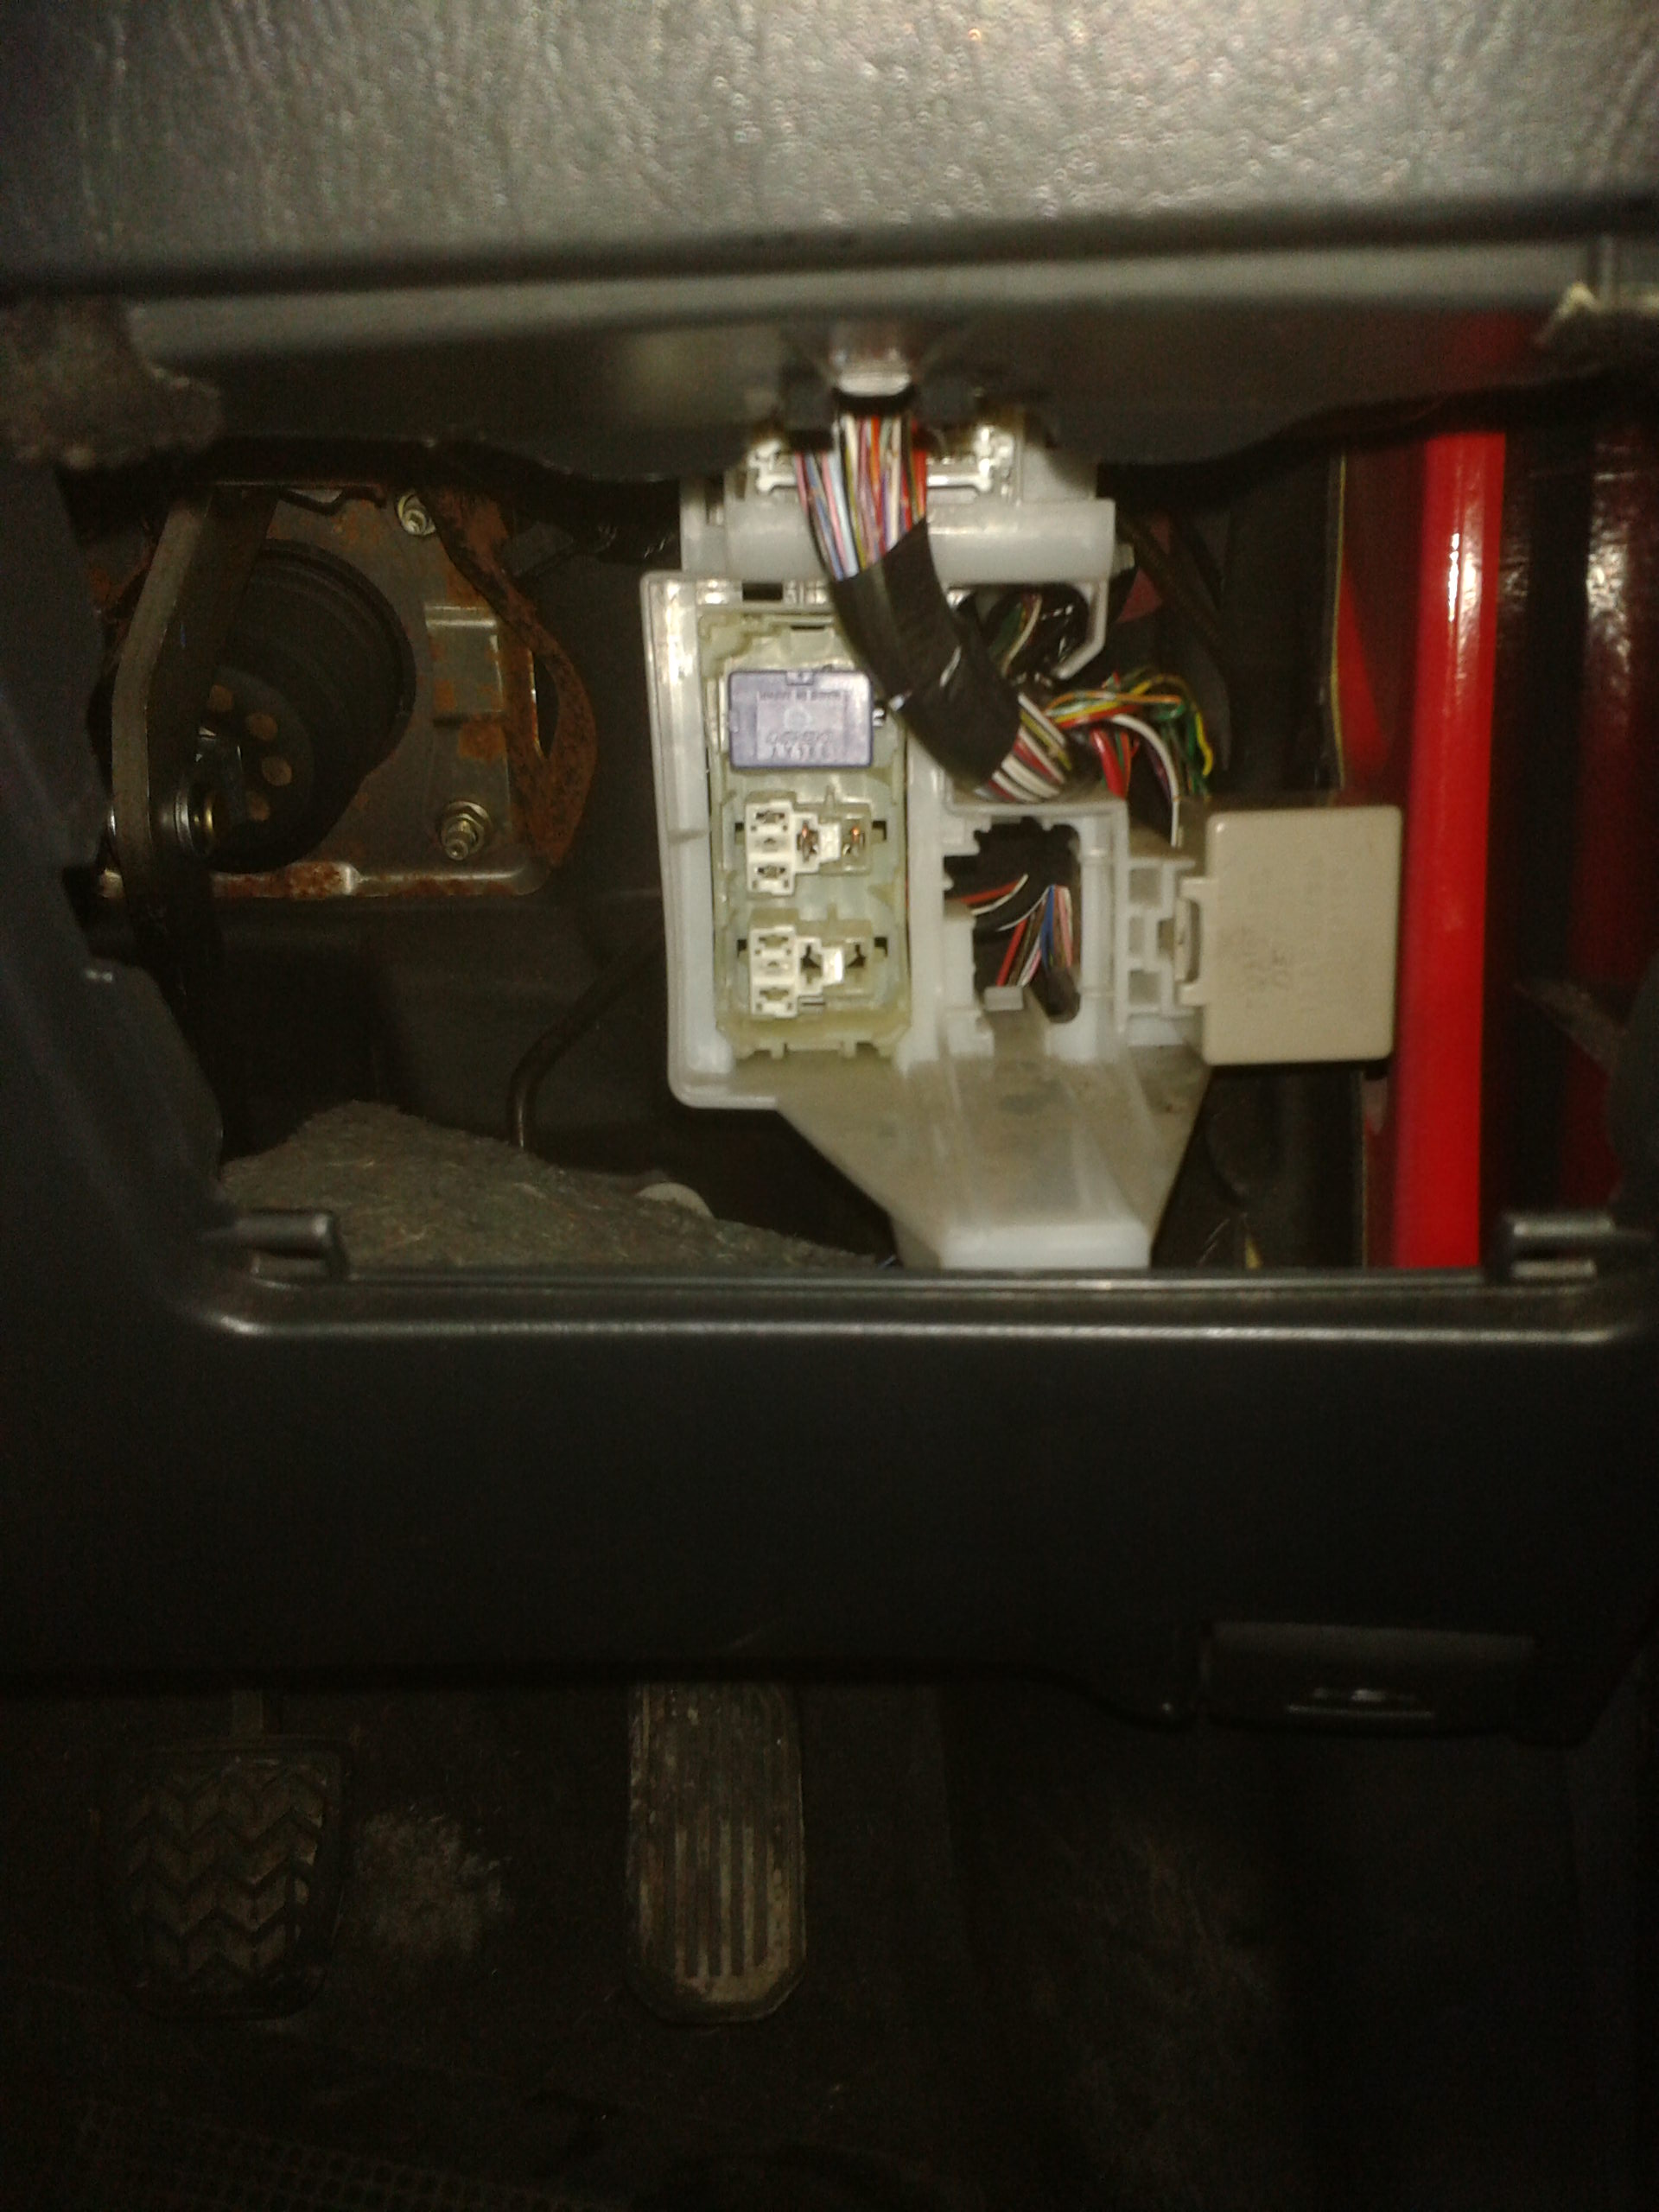 2002 Toyota Corolla Fuse Box Location Wiring Library